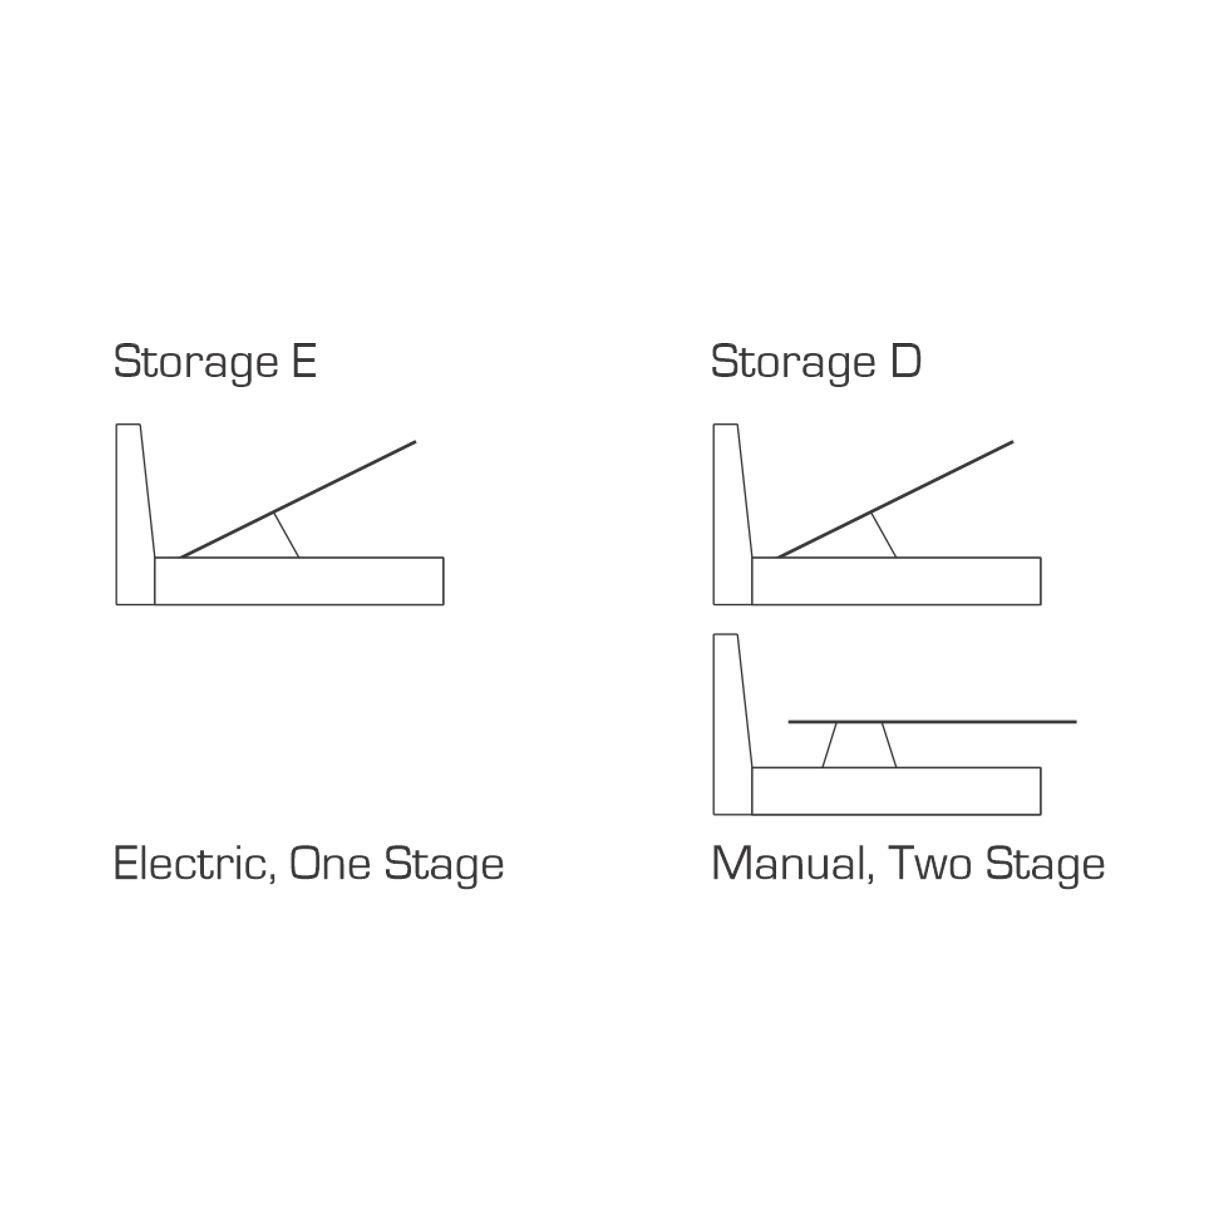 Storage E vs D 1216px x 1217px (1)